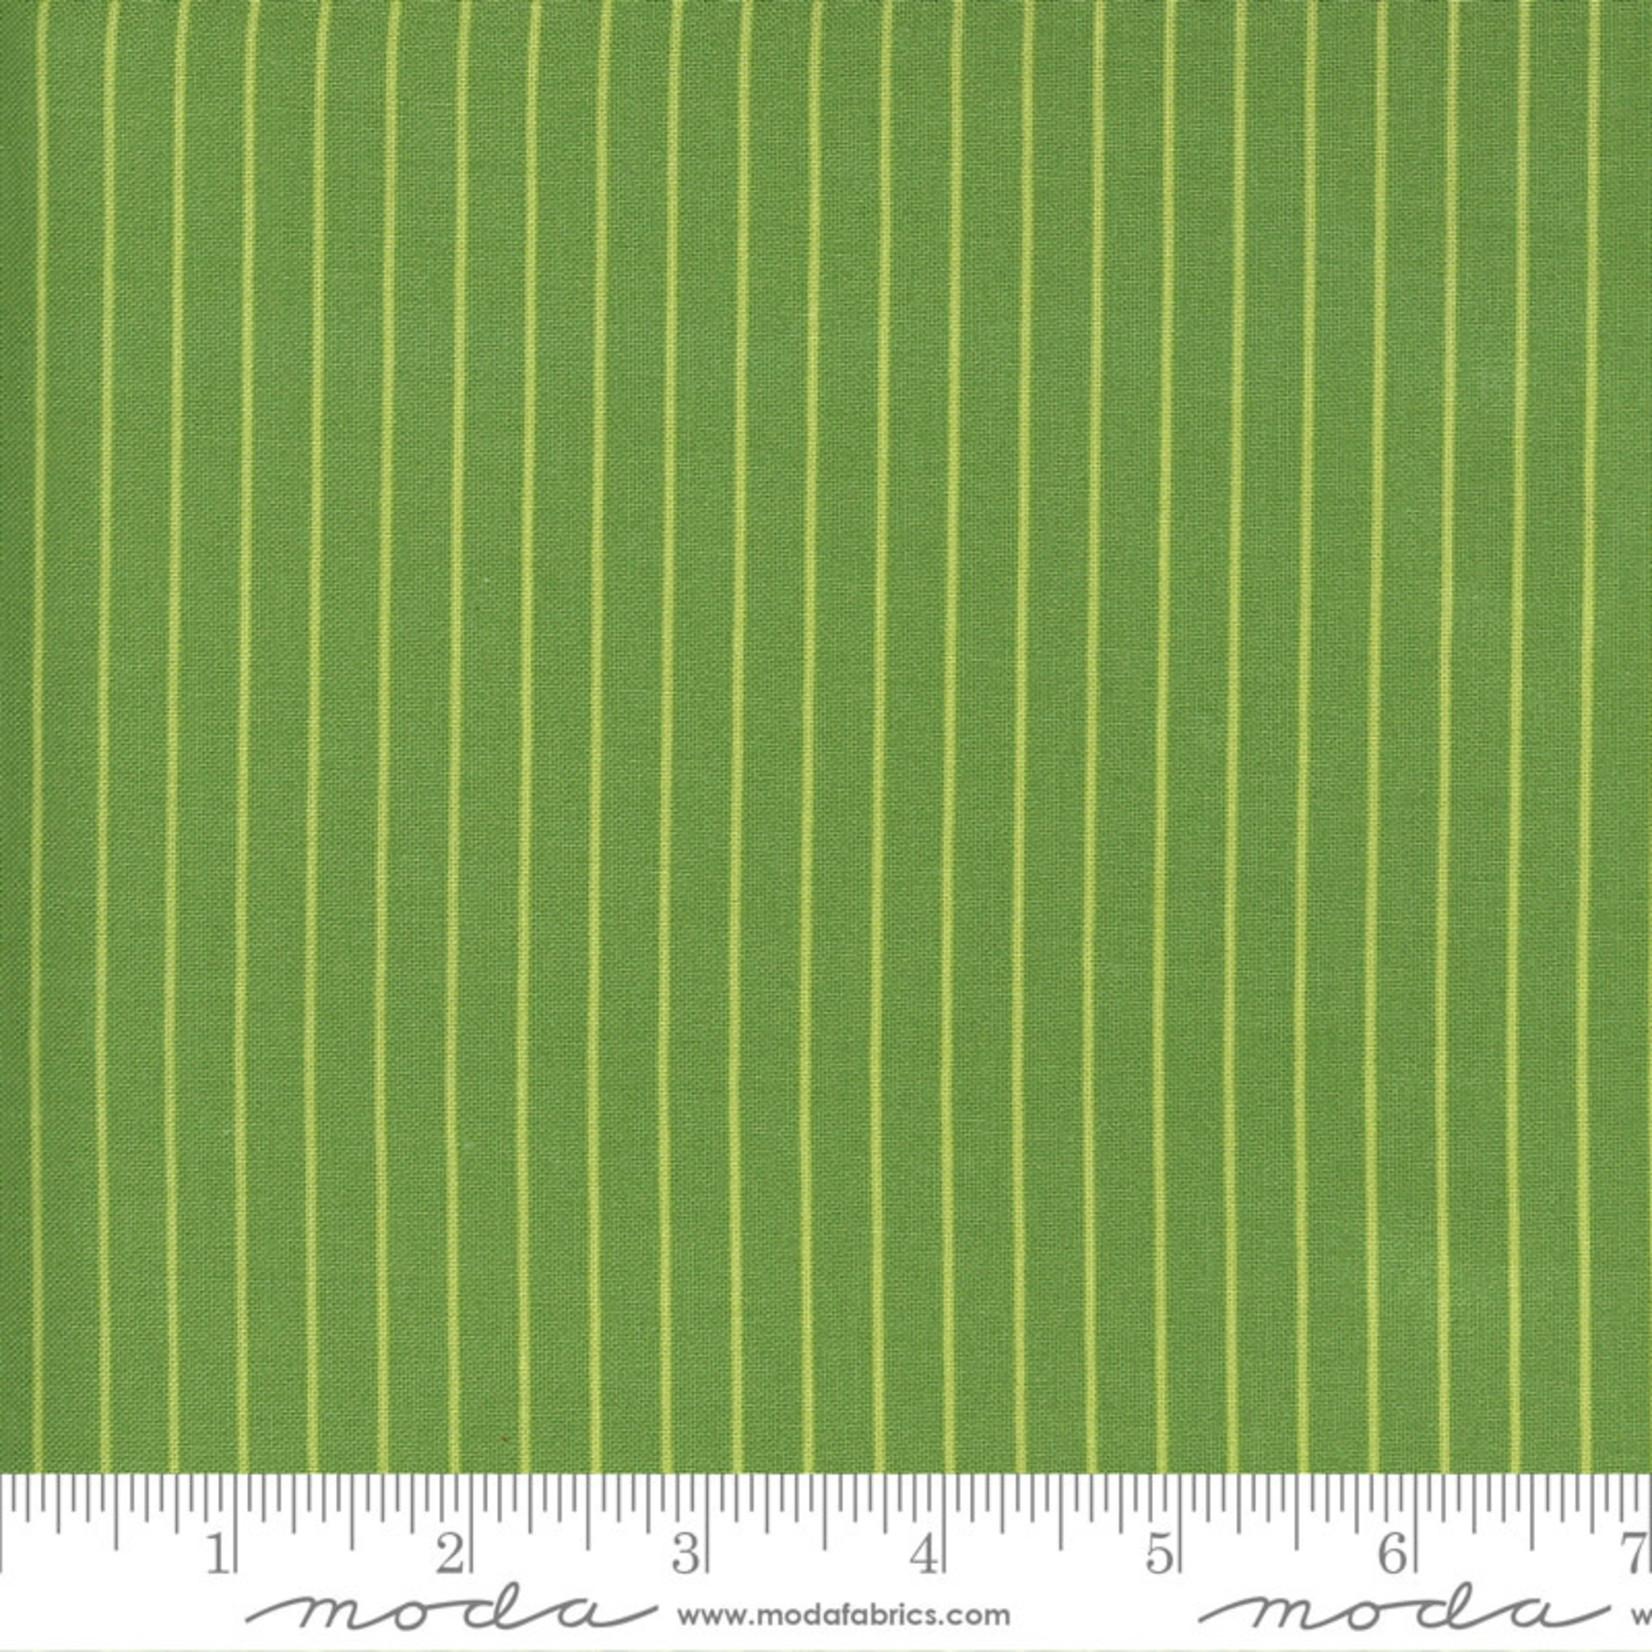 Bonnie & Camille Sunday Stroll, Wide Stripe, Green 55228 20 $0.20 per cm or $20/m